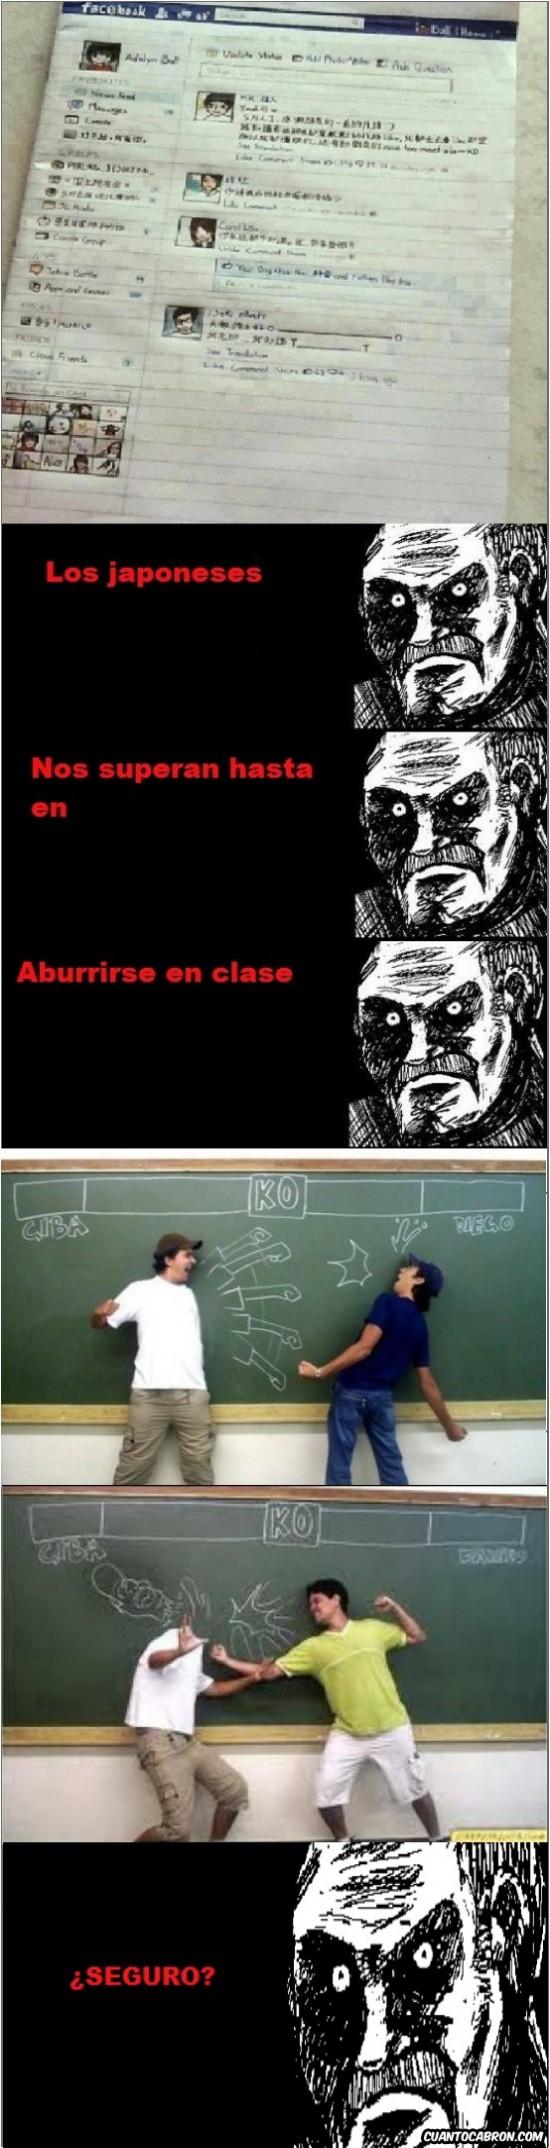 aburrirse en clase,españoles,pizarra